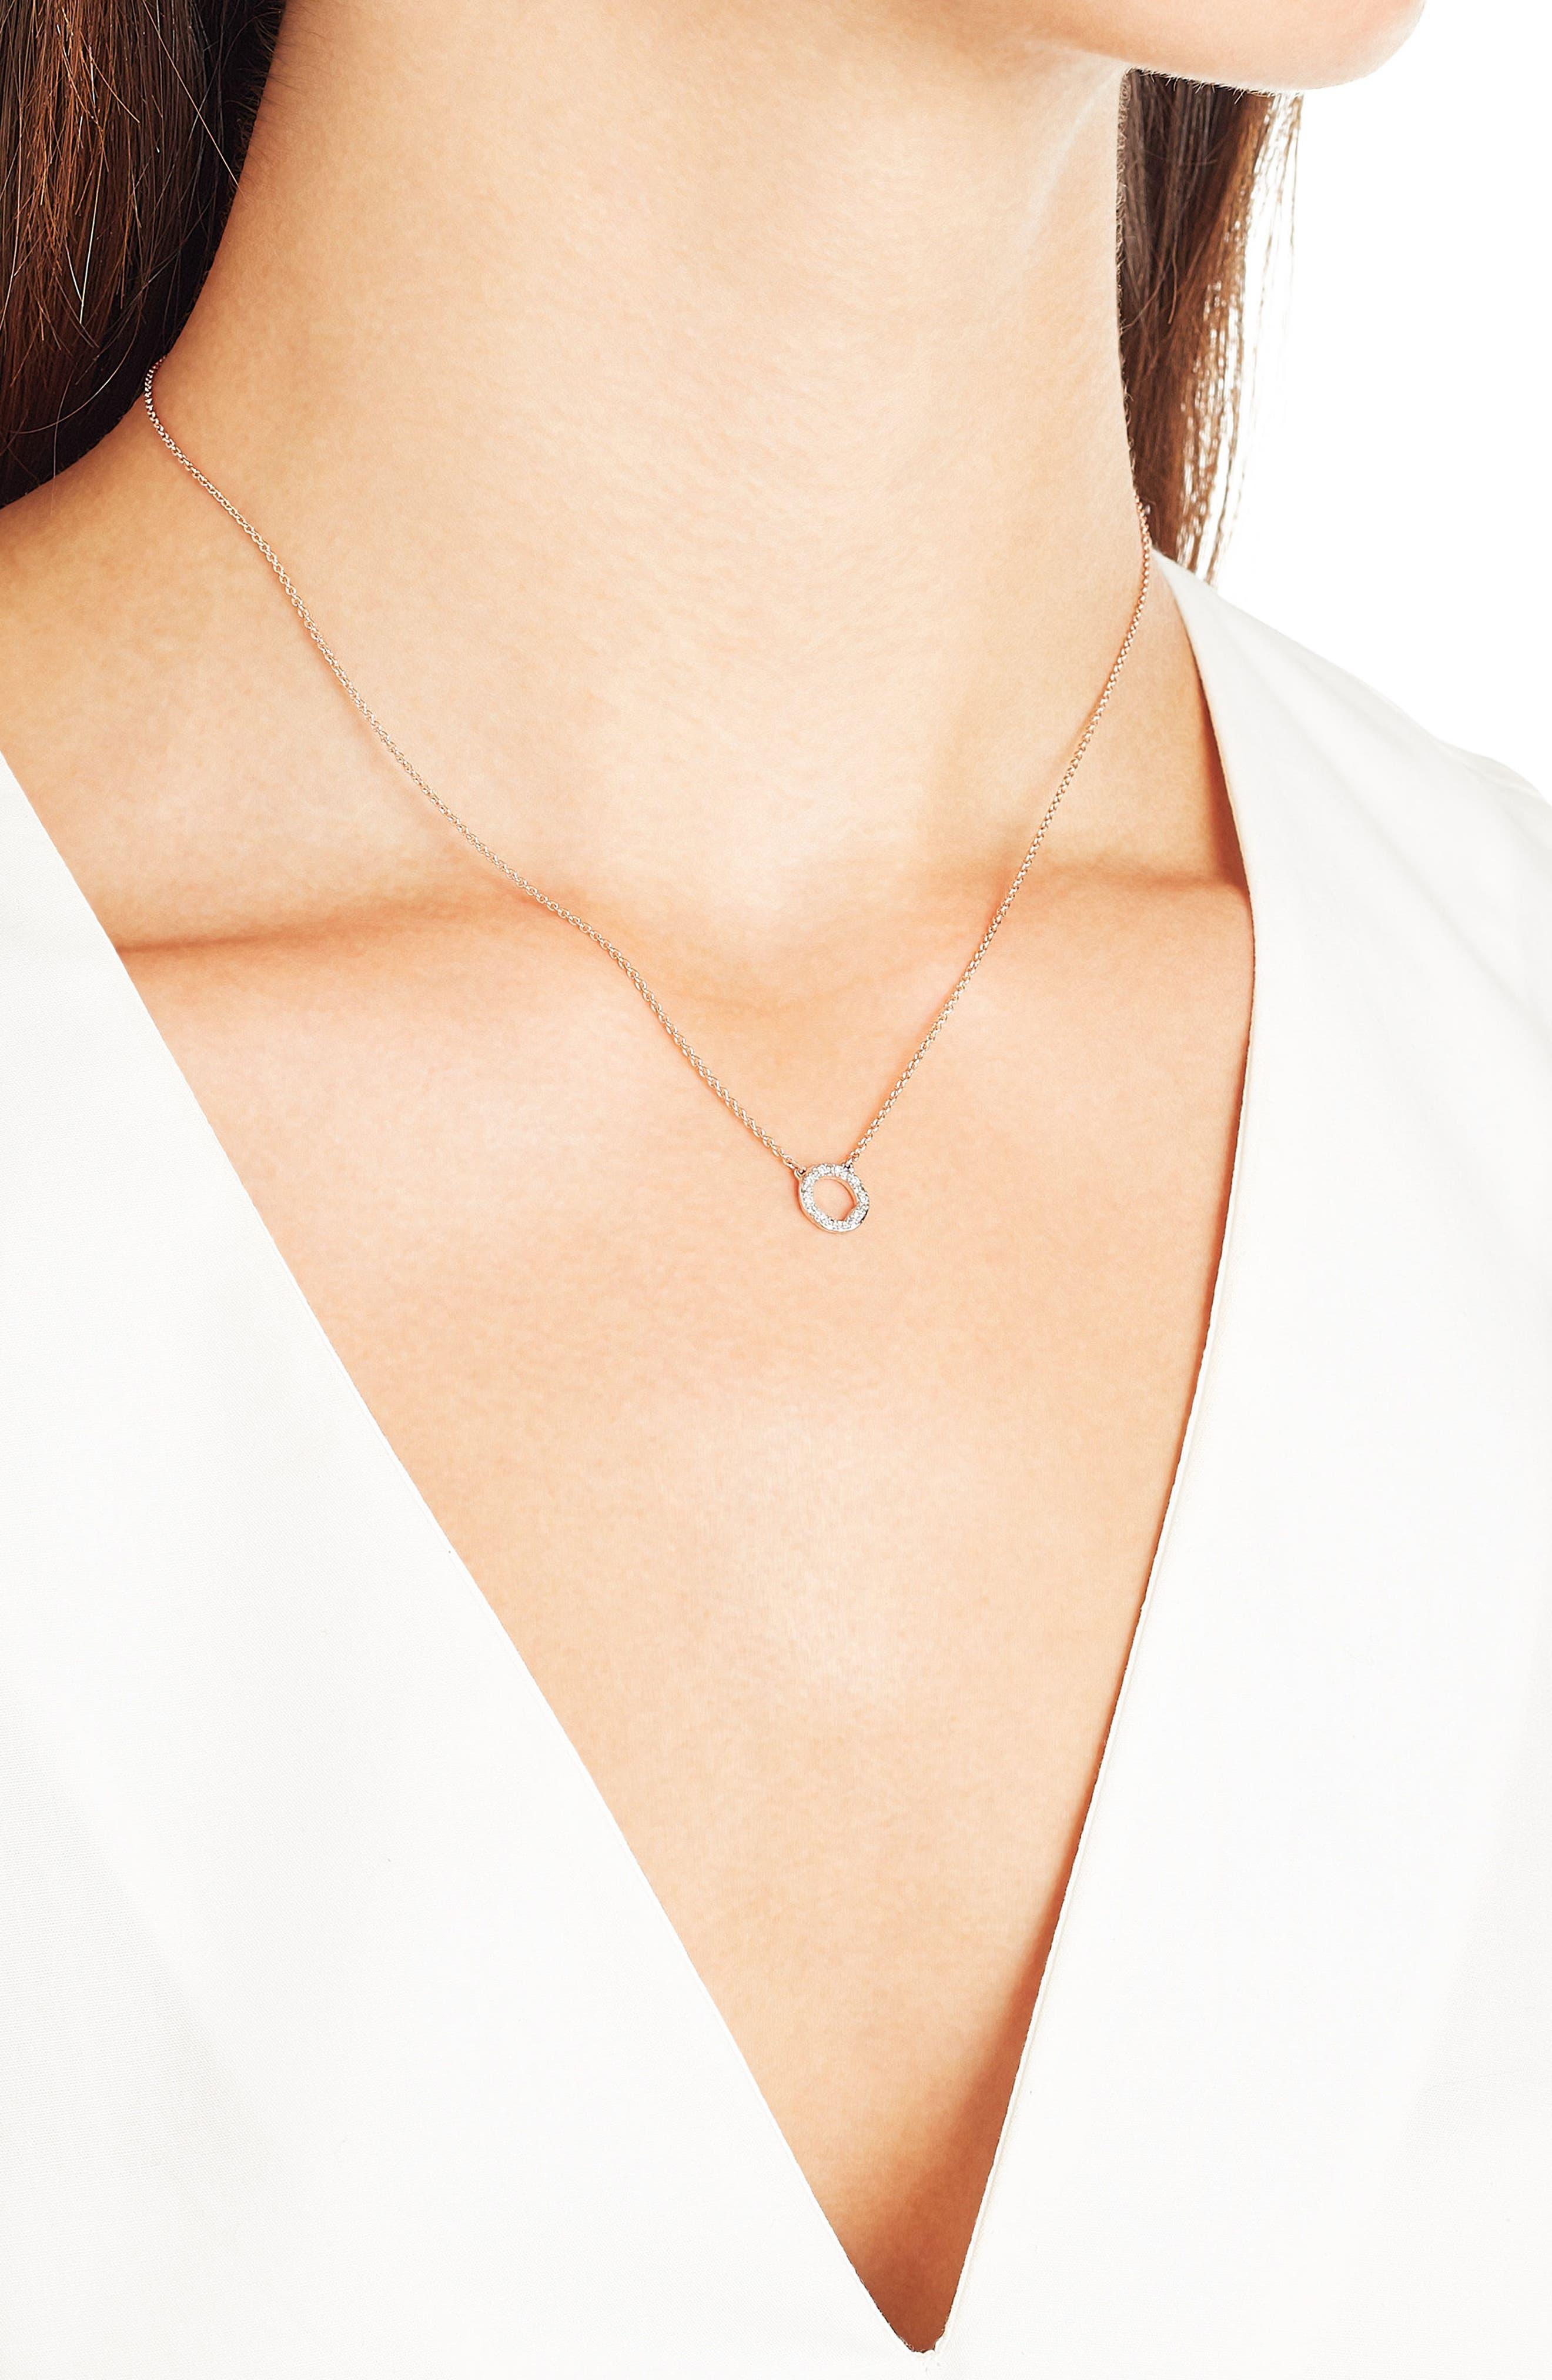 36a79d33914c4a Monica Vinader Delicate Necklaces for Women | Nordstrom